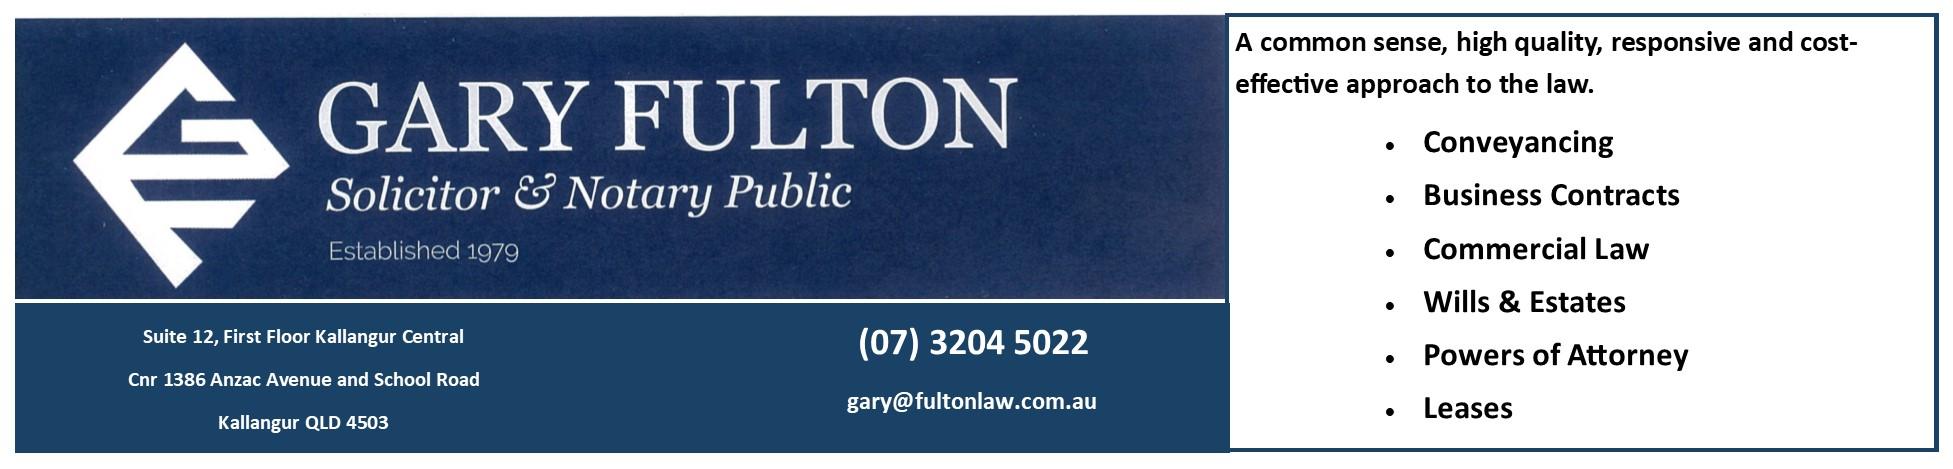 20201111-Gary-Fulton-Final